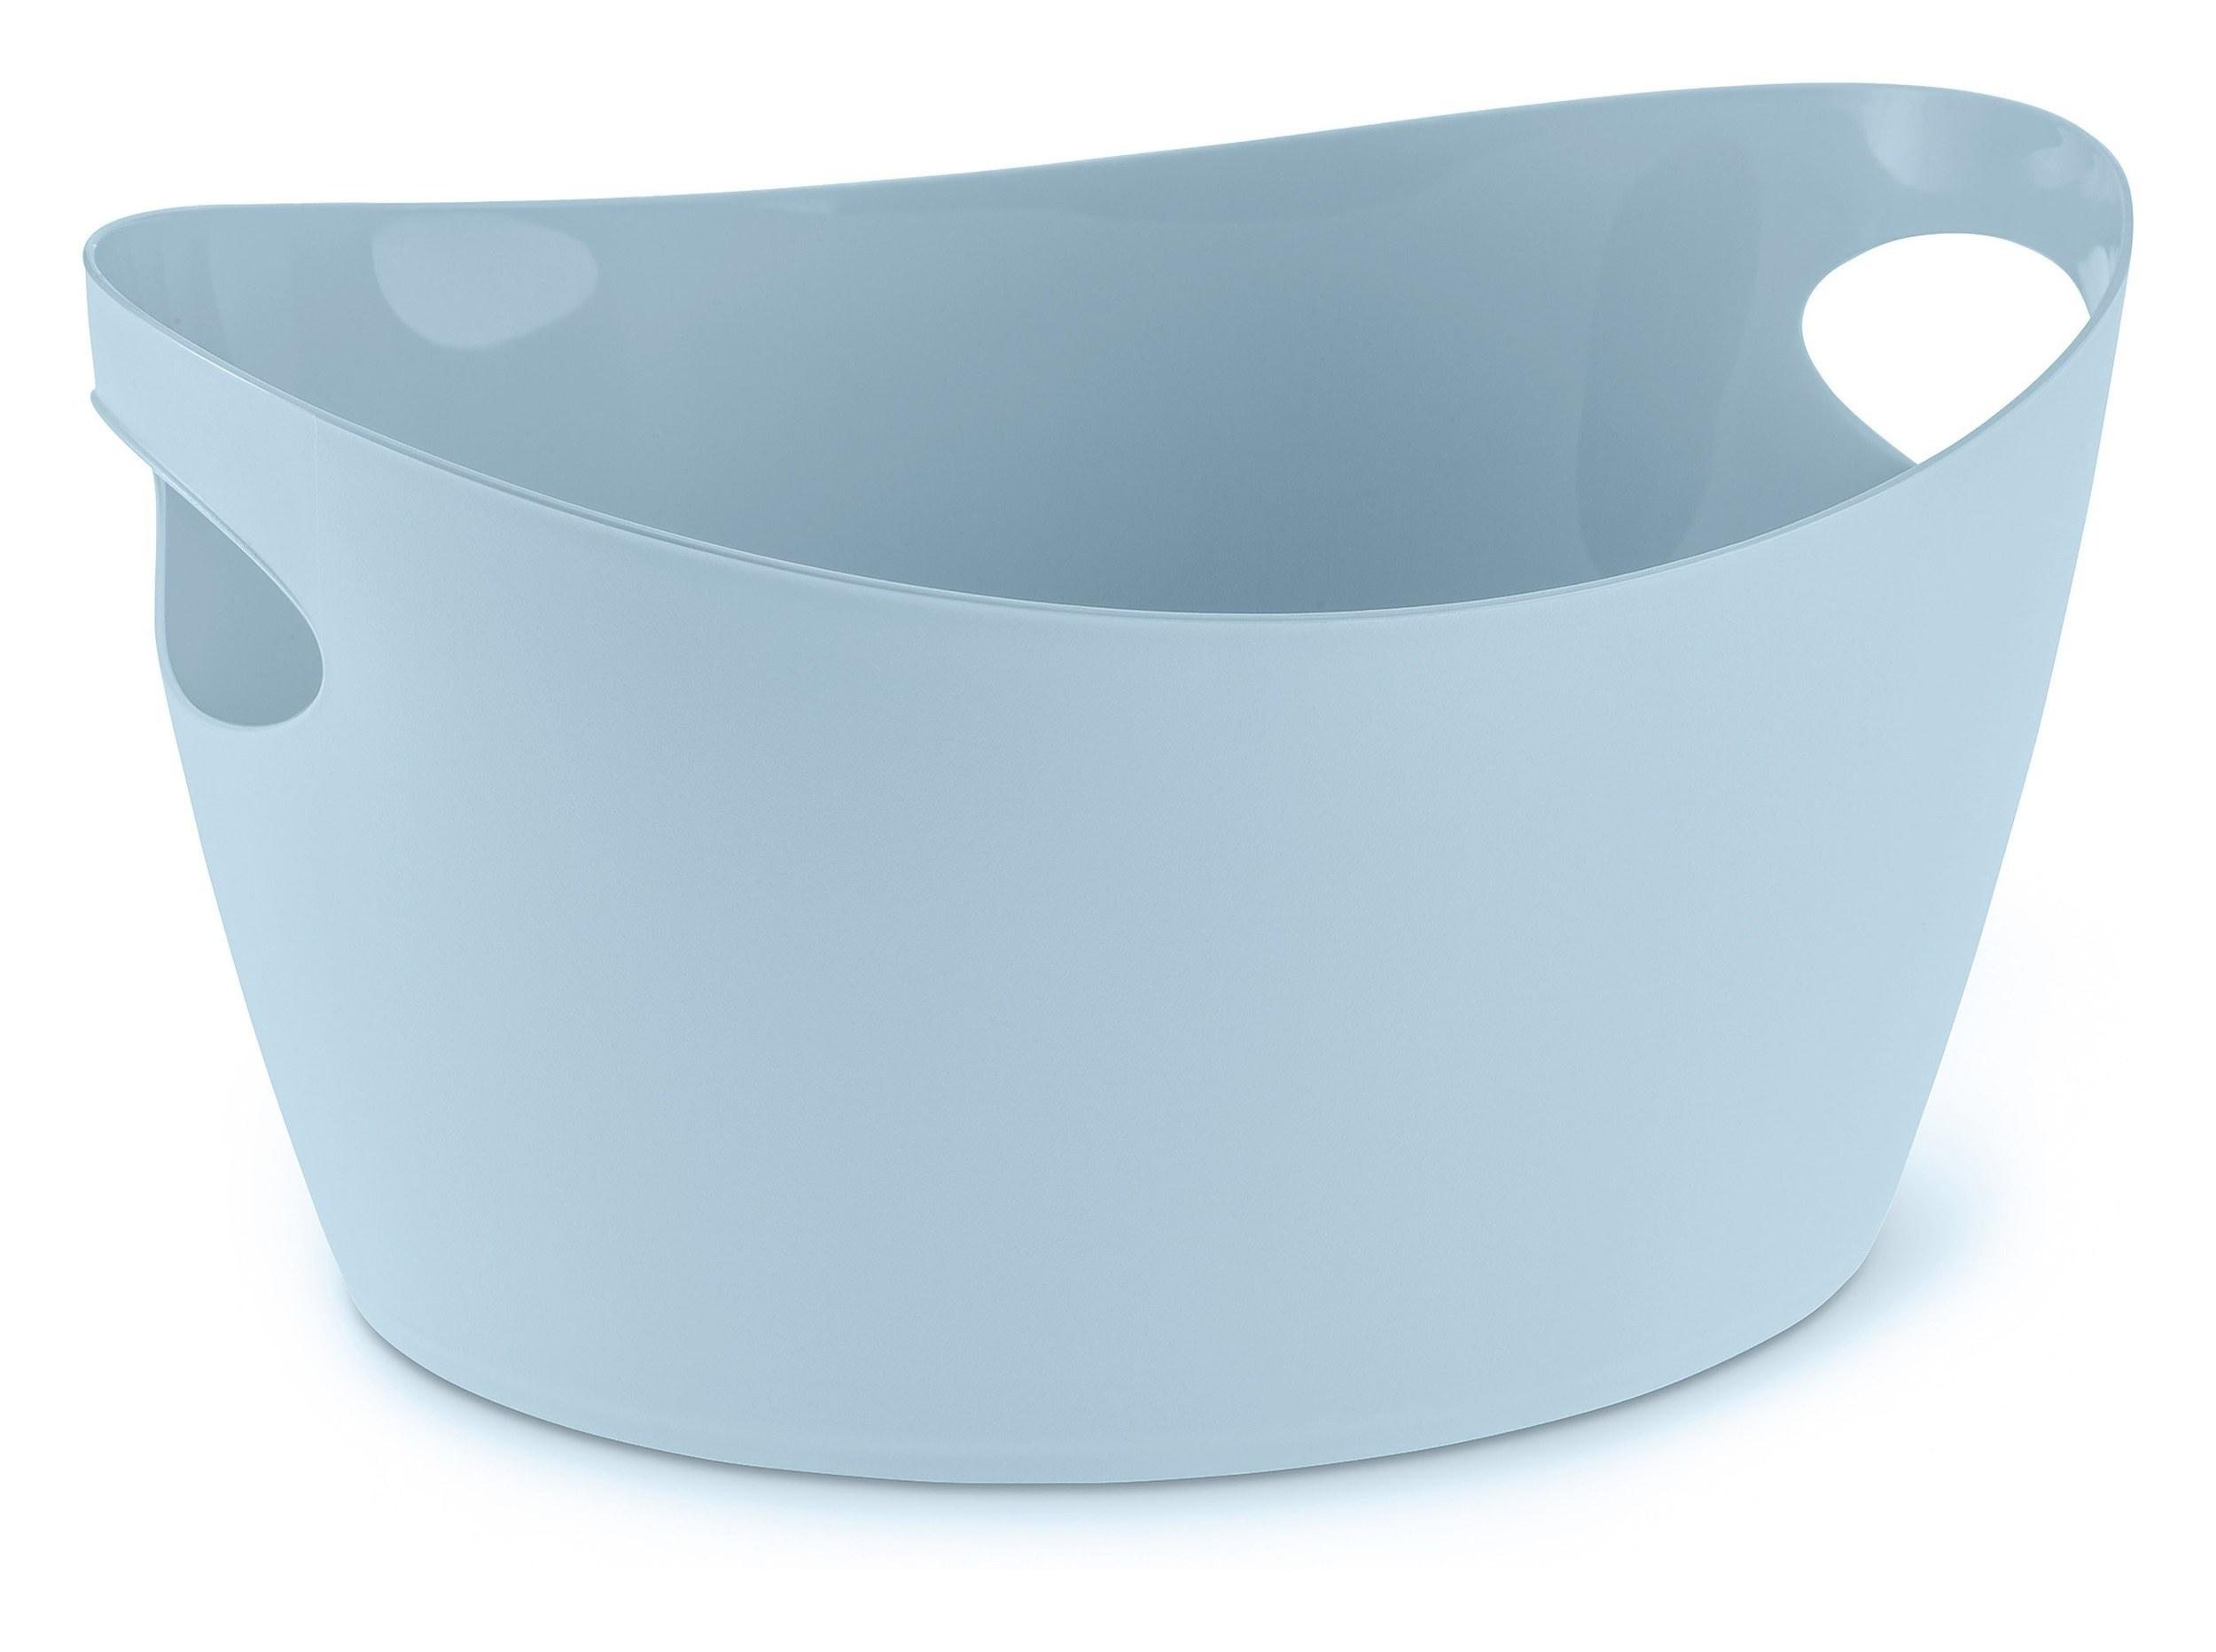 Miska Bottichelli M pastelowy błękit